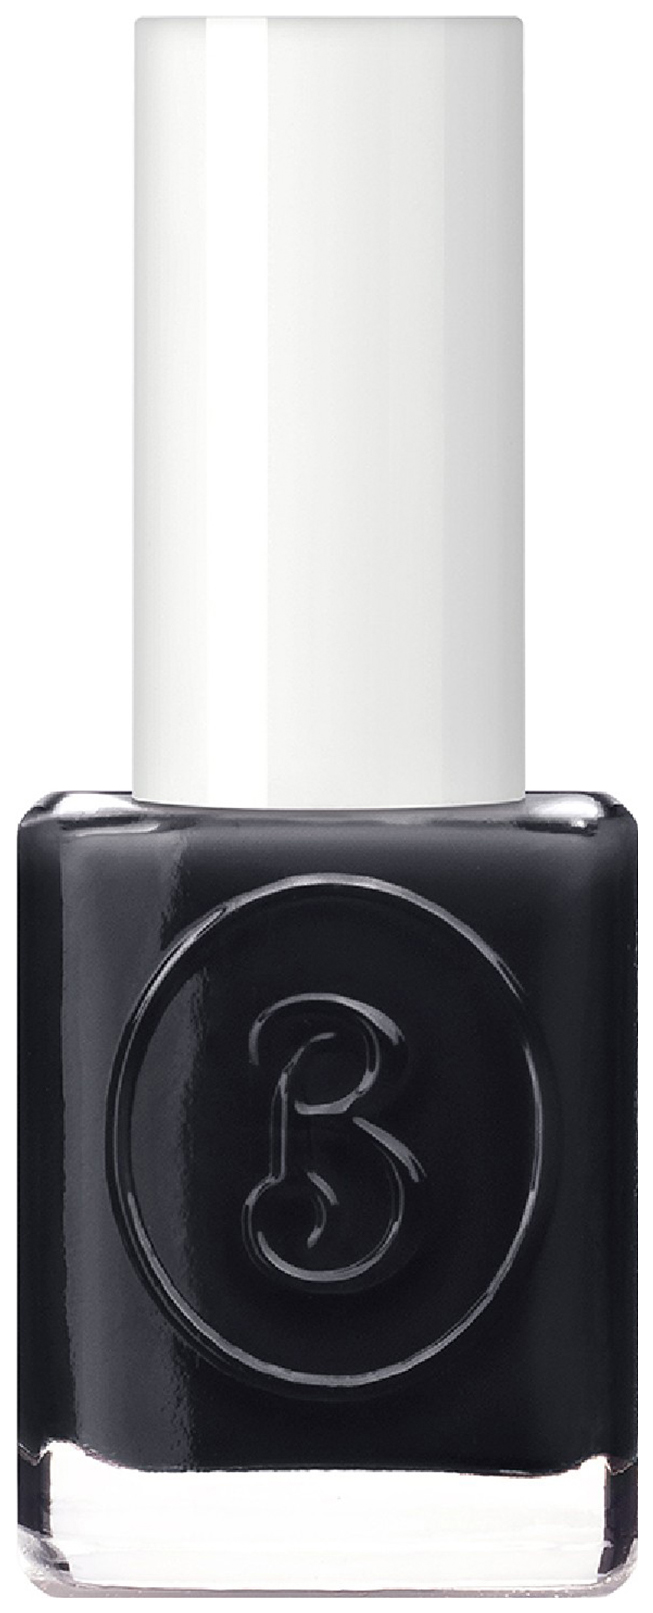 Лак для ногтей Berenice Oxygen Nail Lacquer 96 Night Trip 15 мл по цене 415